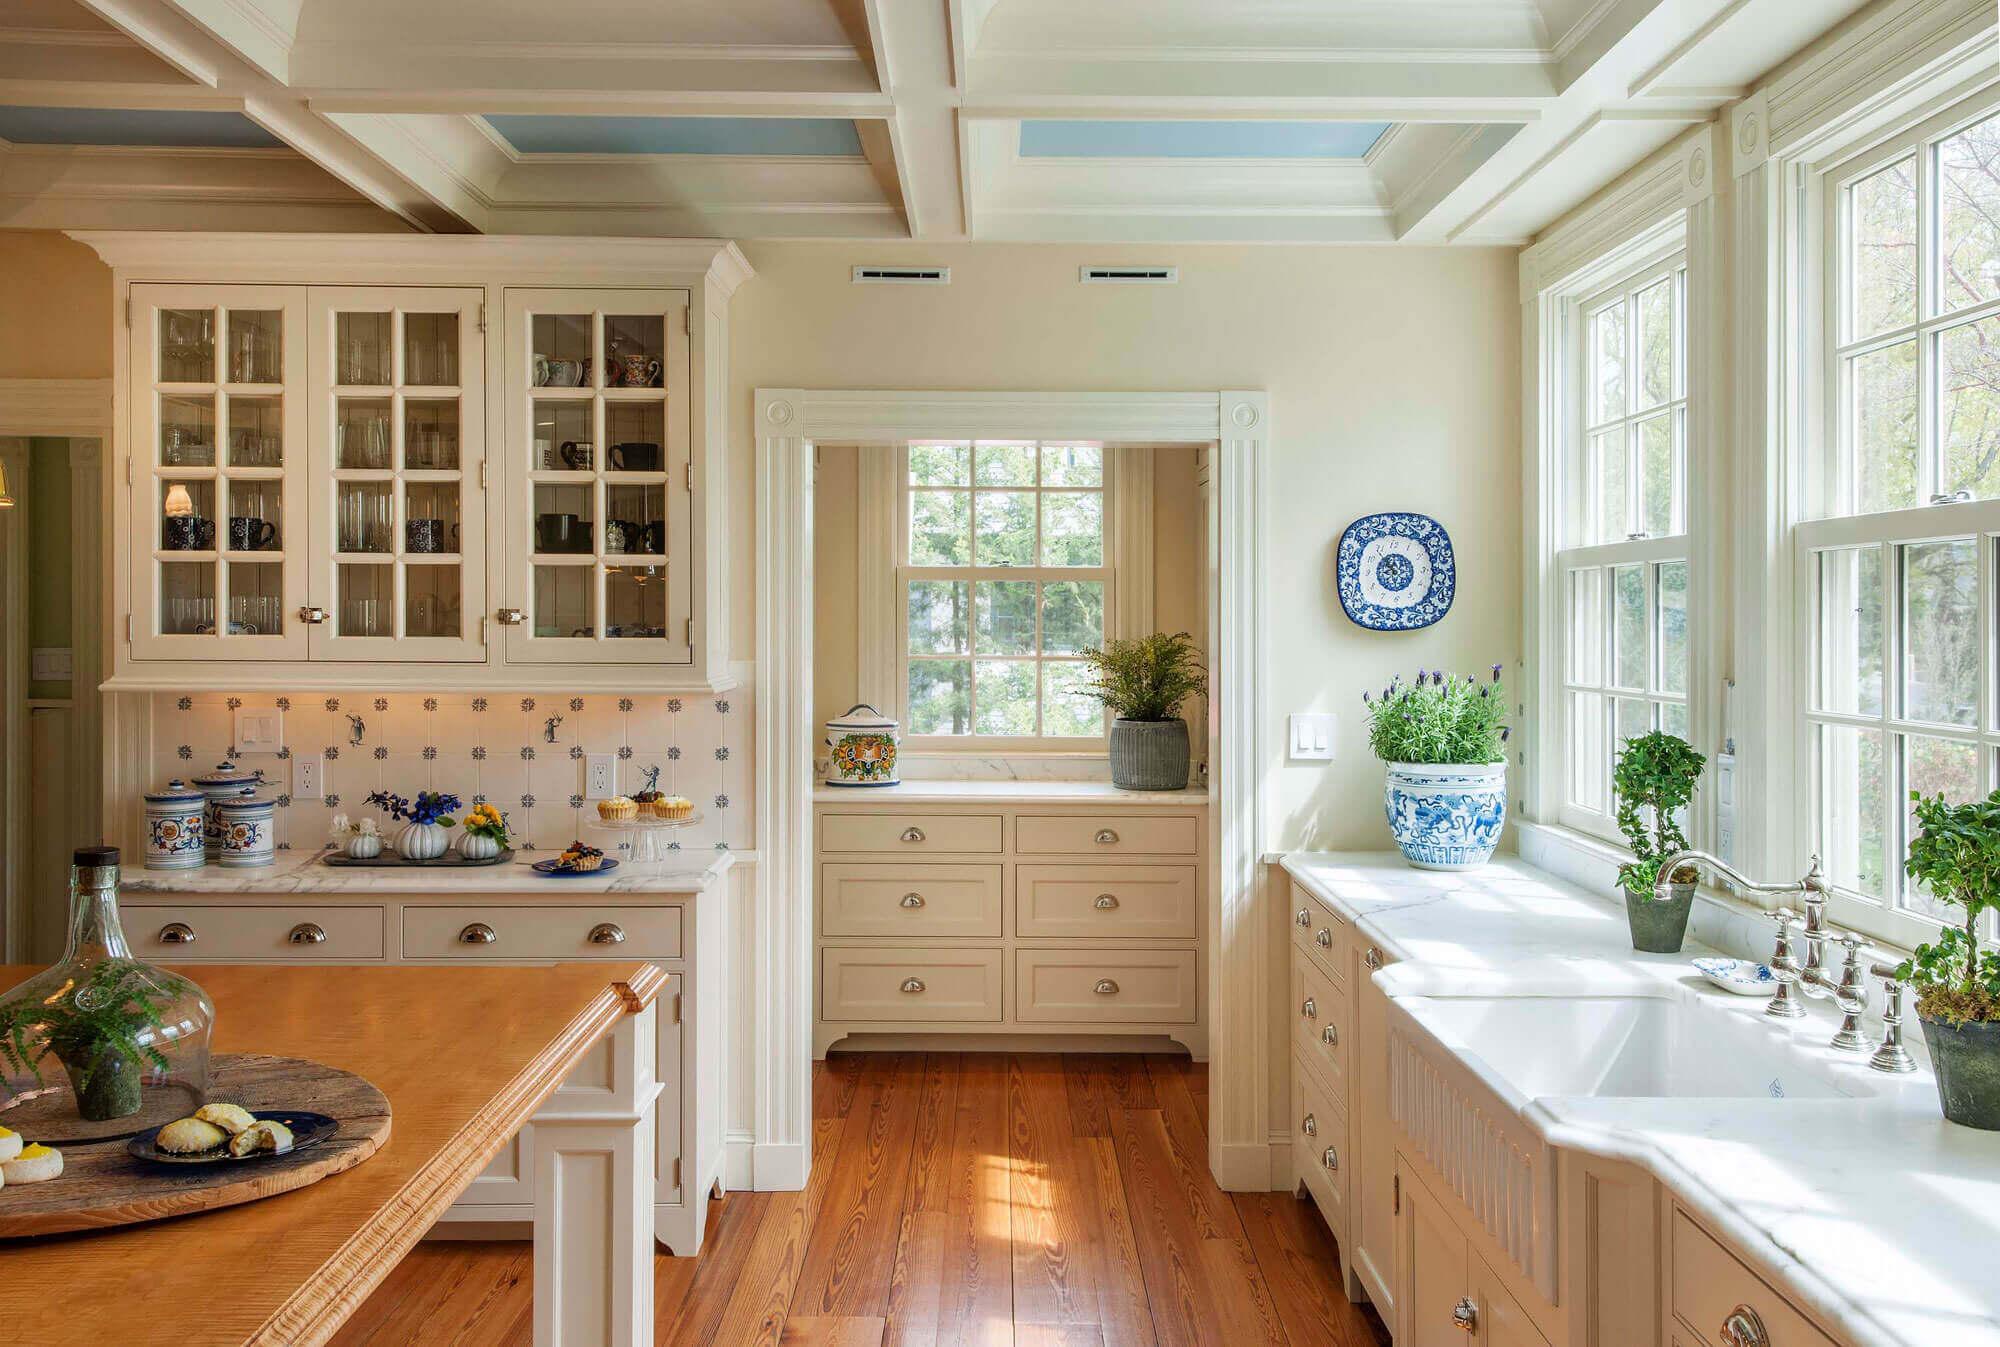 Greek Revival Kitchen - Architecture